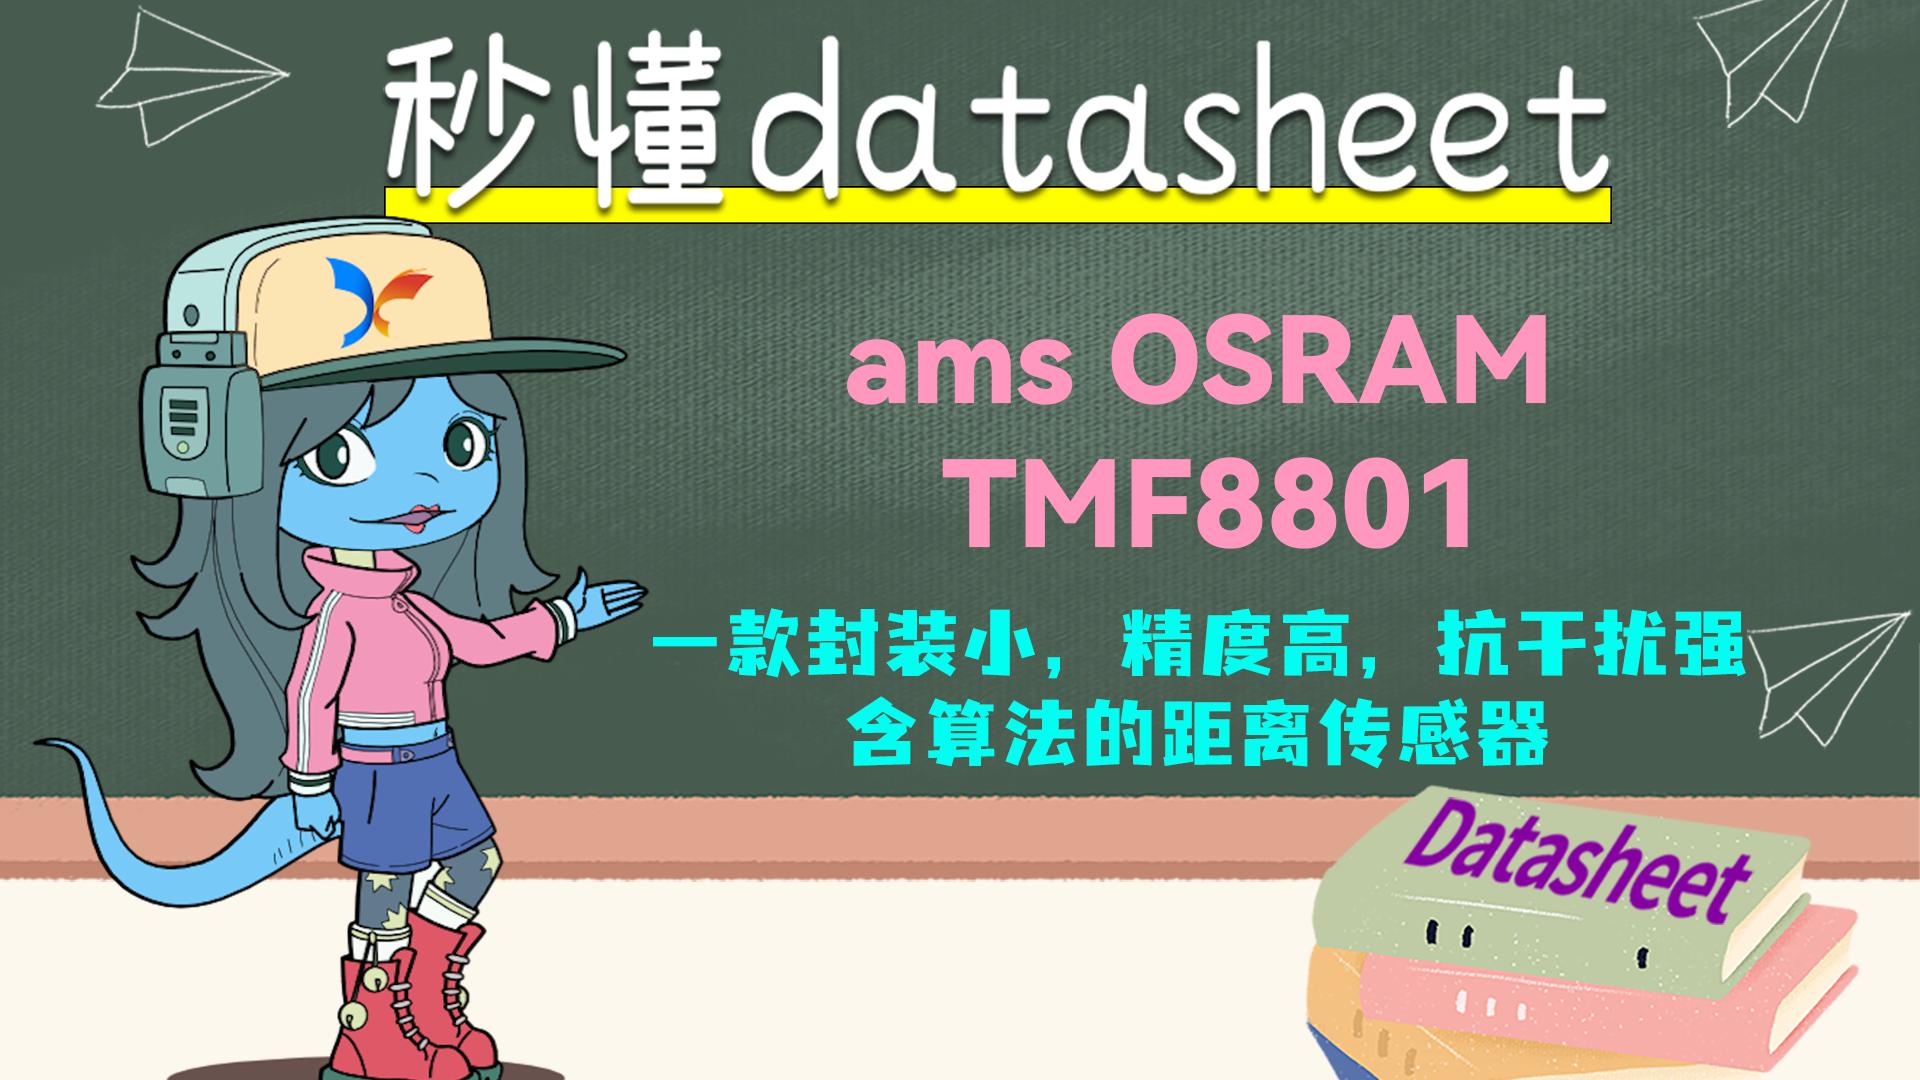 【秒懂datasheet】ams OSRAM TMF8801 距离传感器